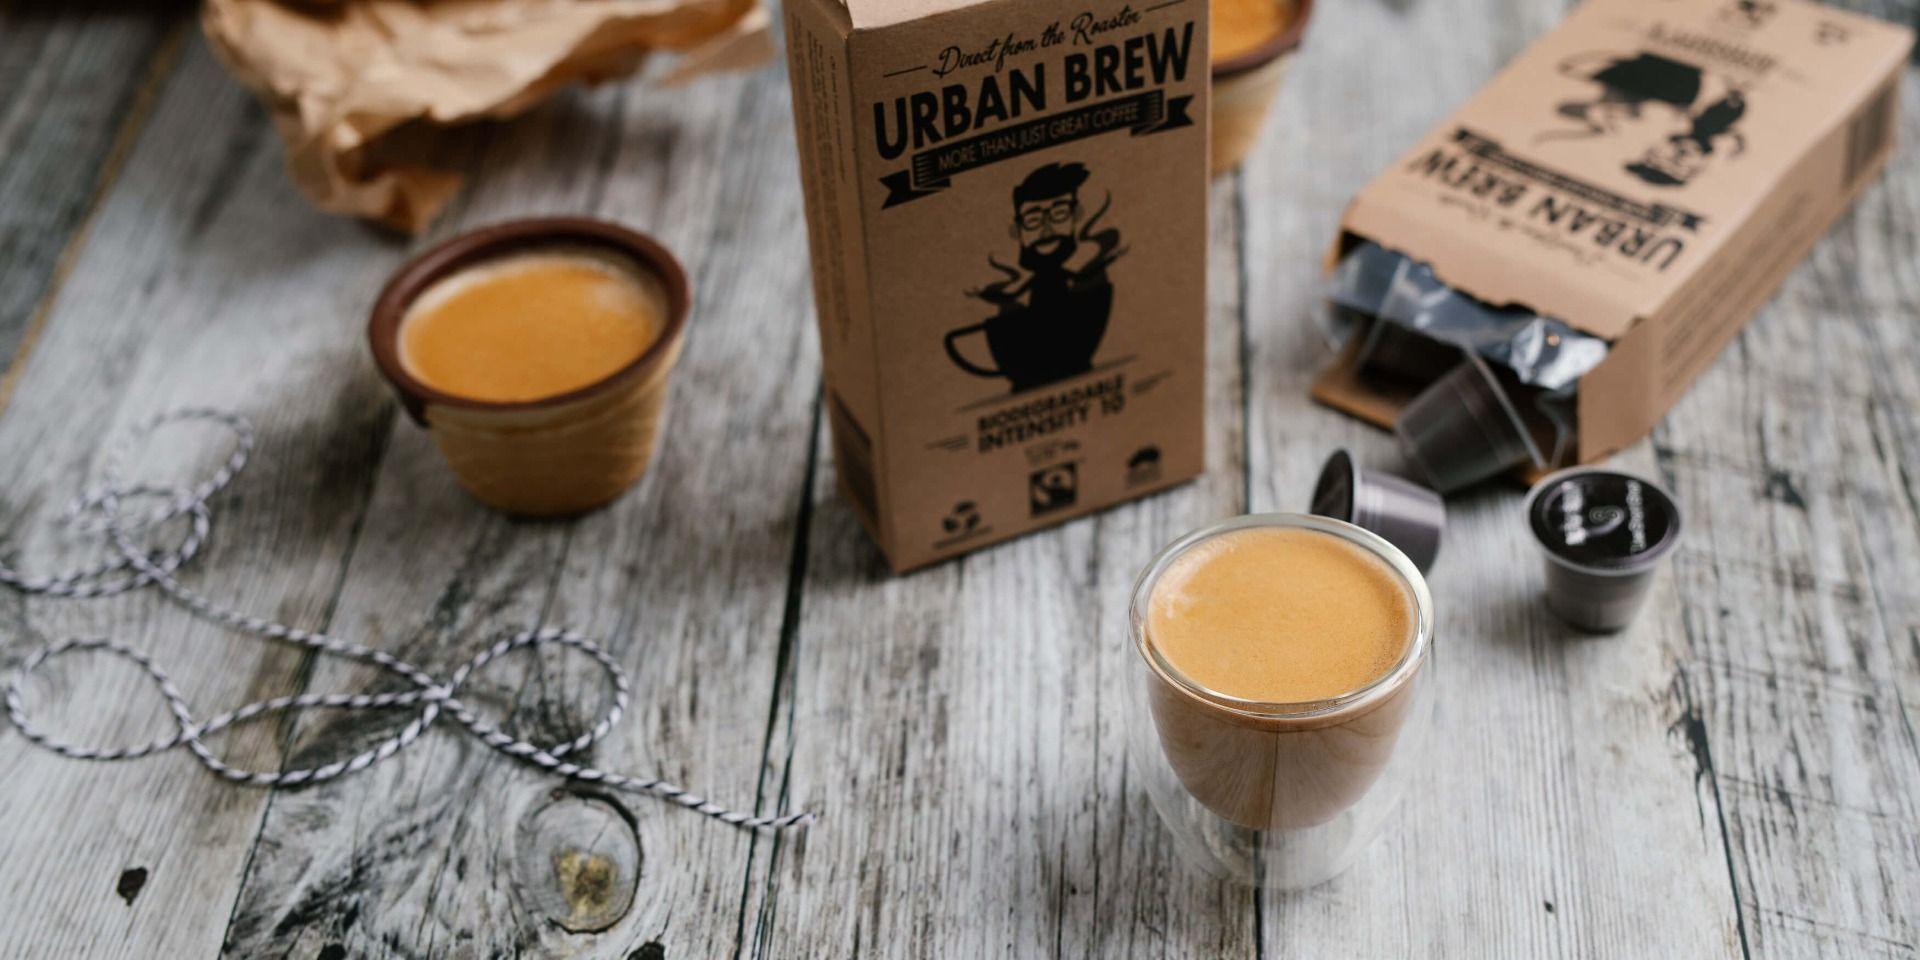 Coffee Pods Coffee Capsules I Urban Brew Coffee Pods Coffee Capsules Brewing